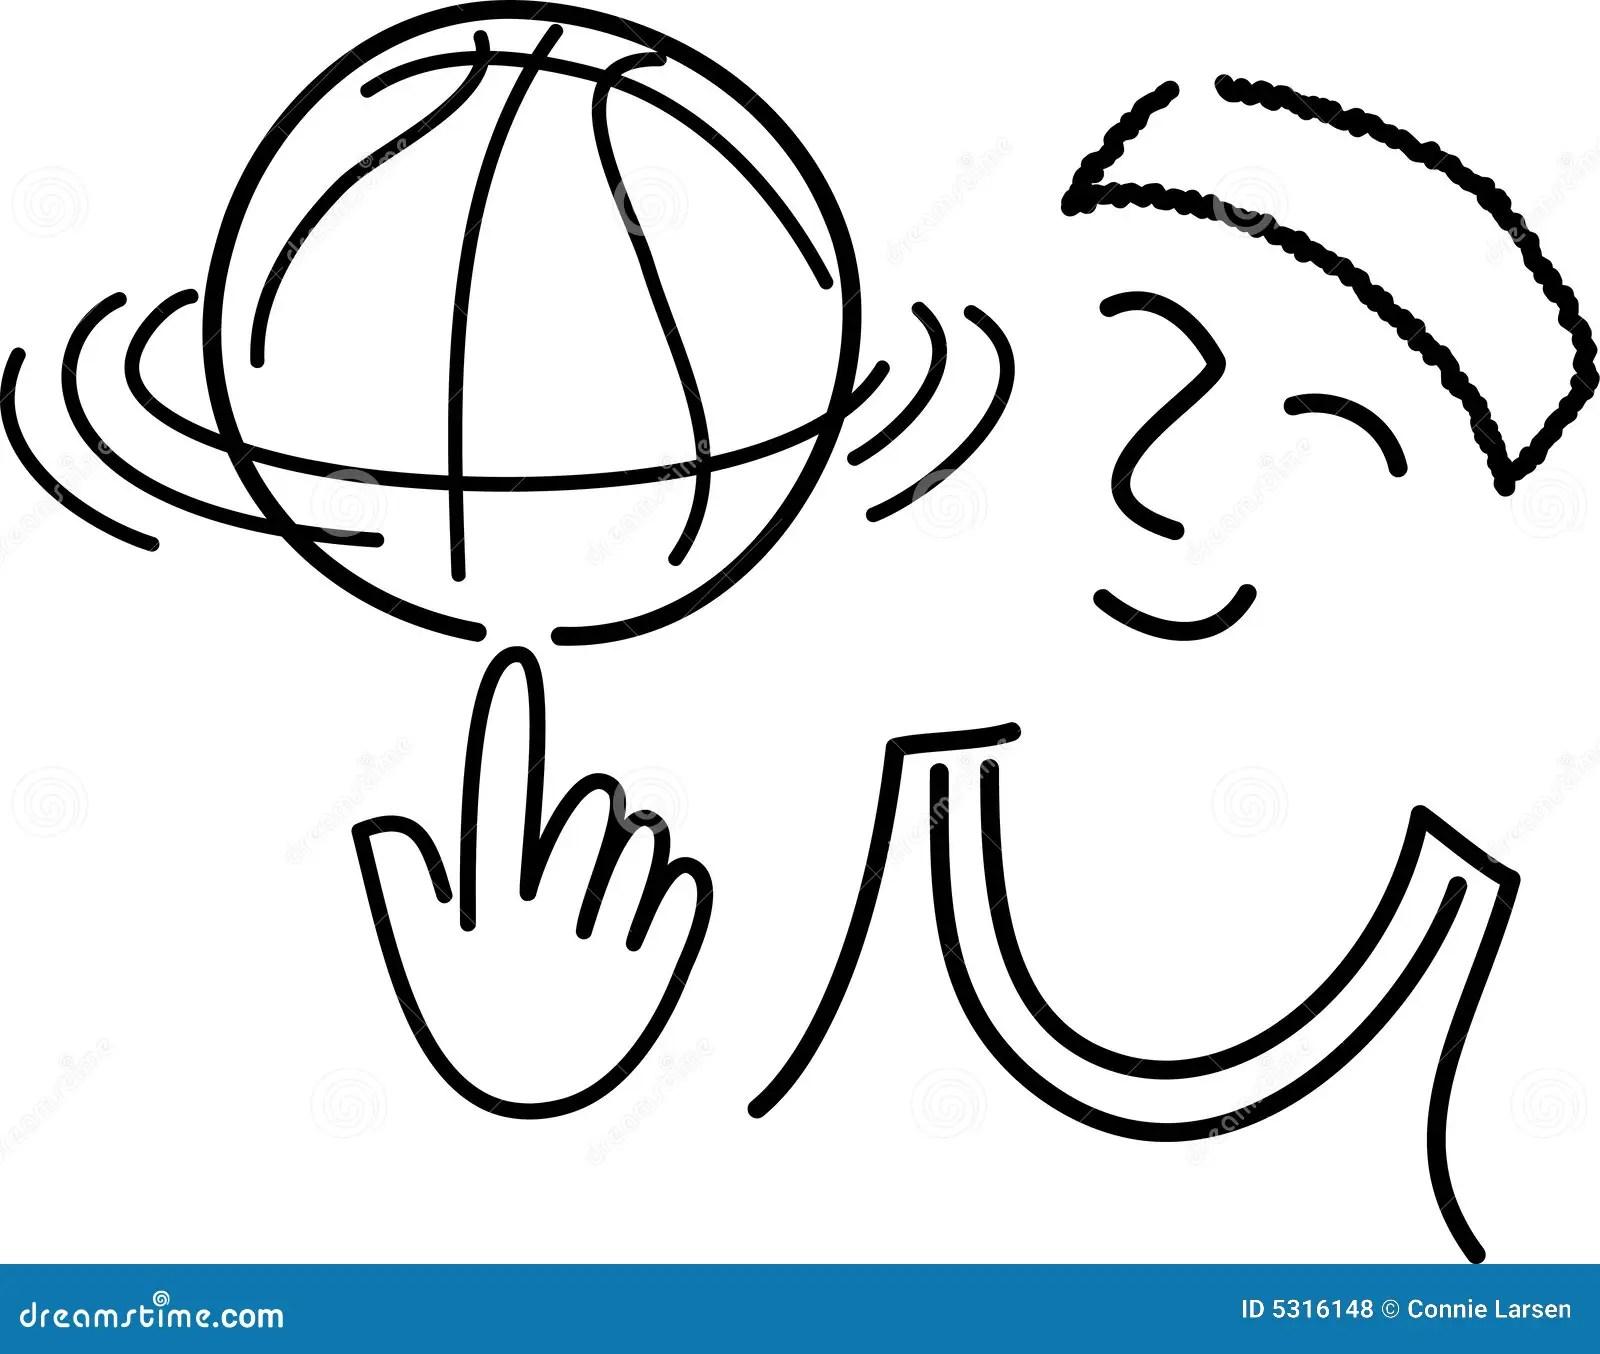 Cartoon Basketball Player Ai Royalty Free Stock Photos